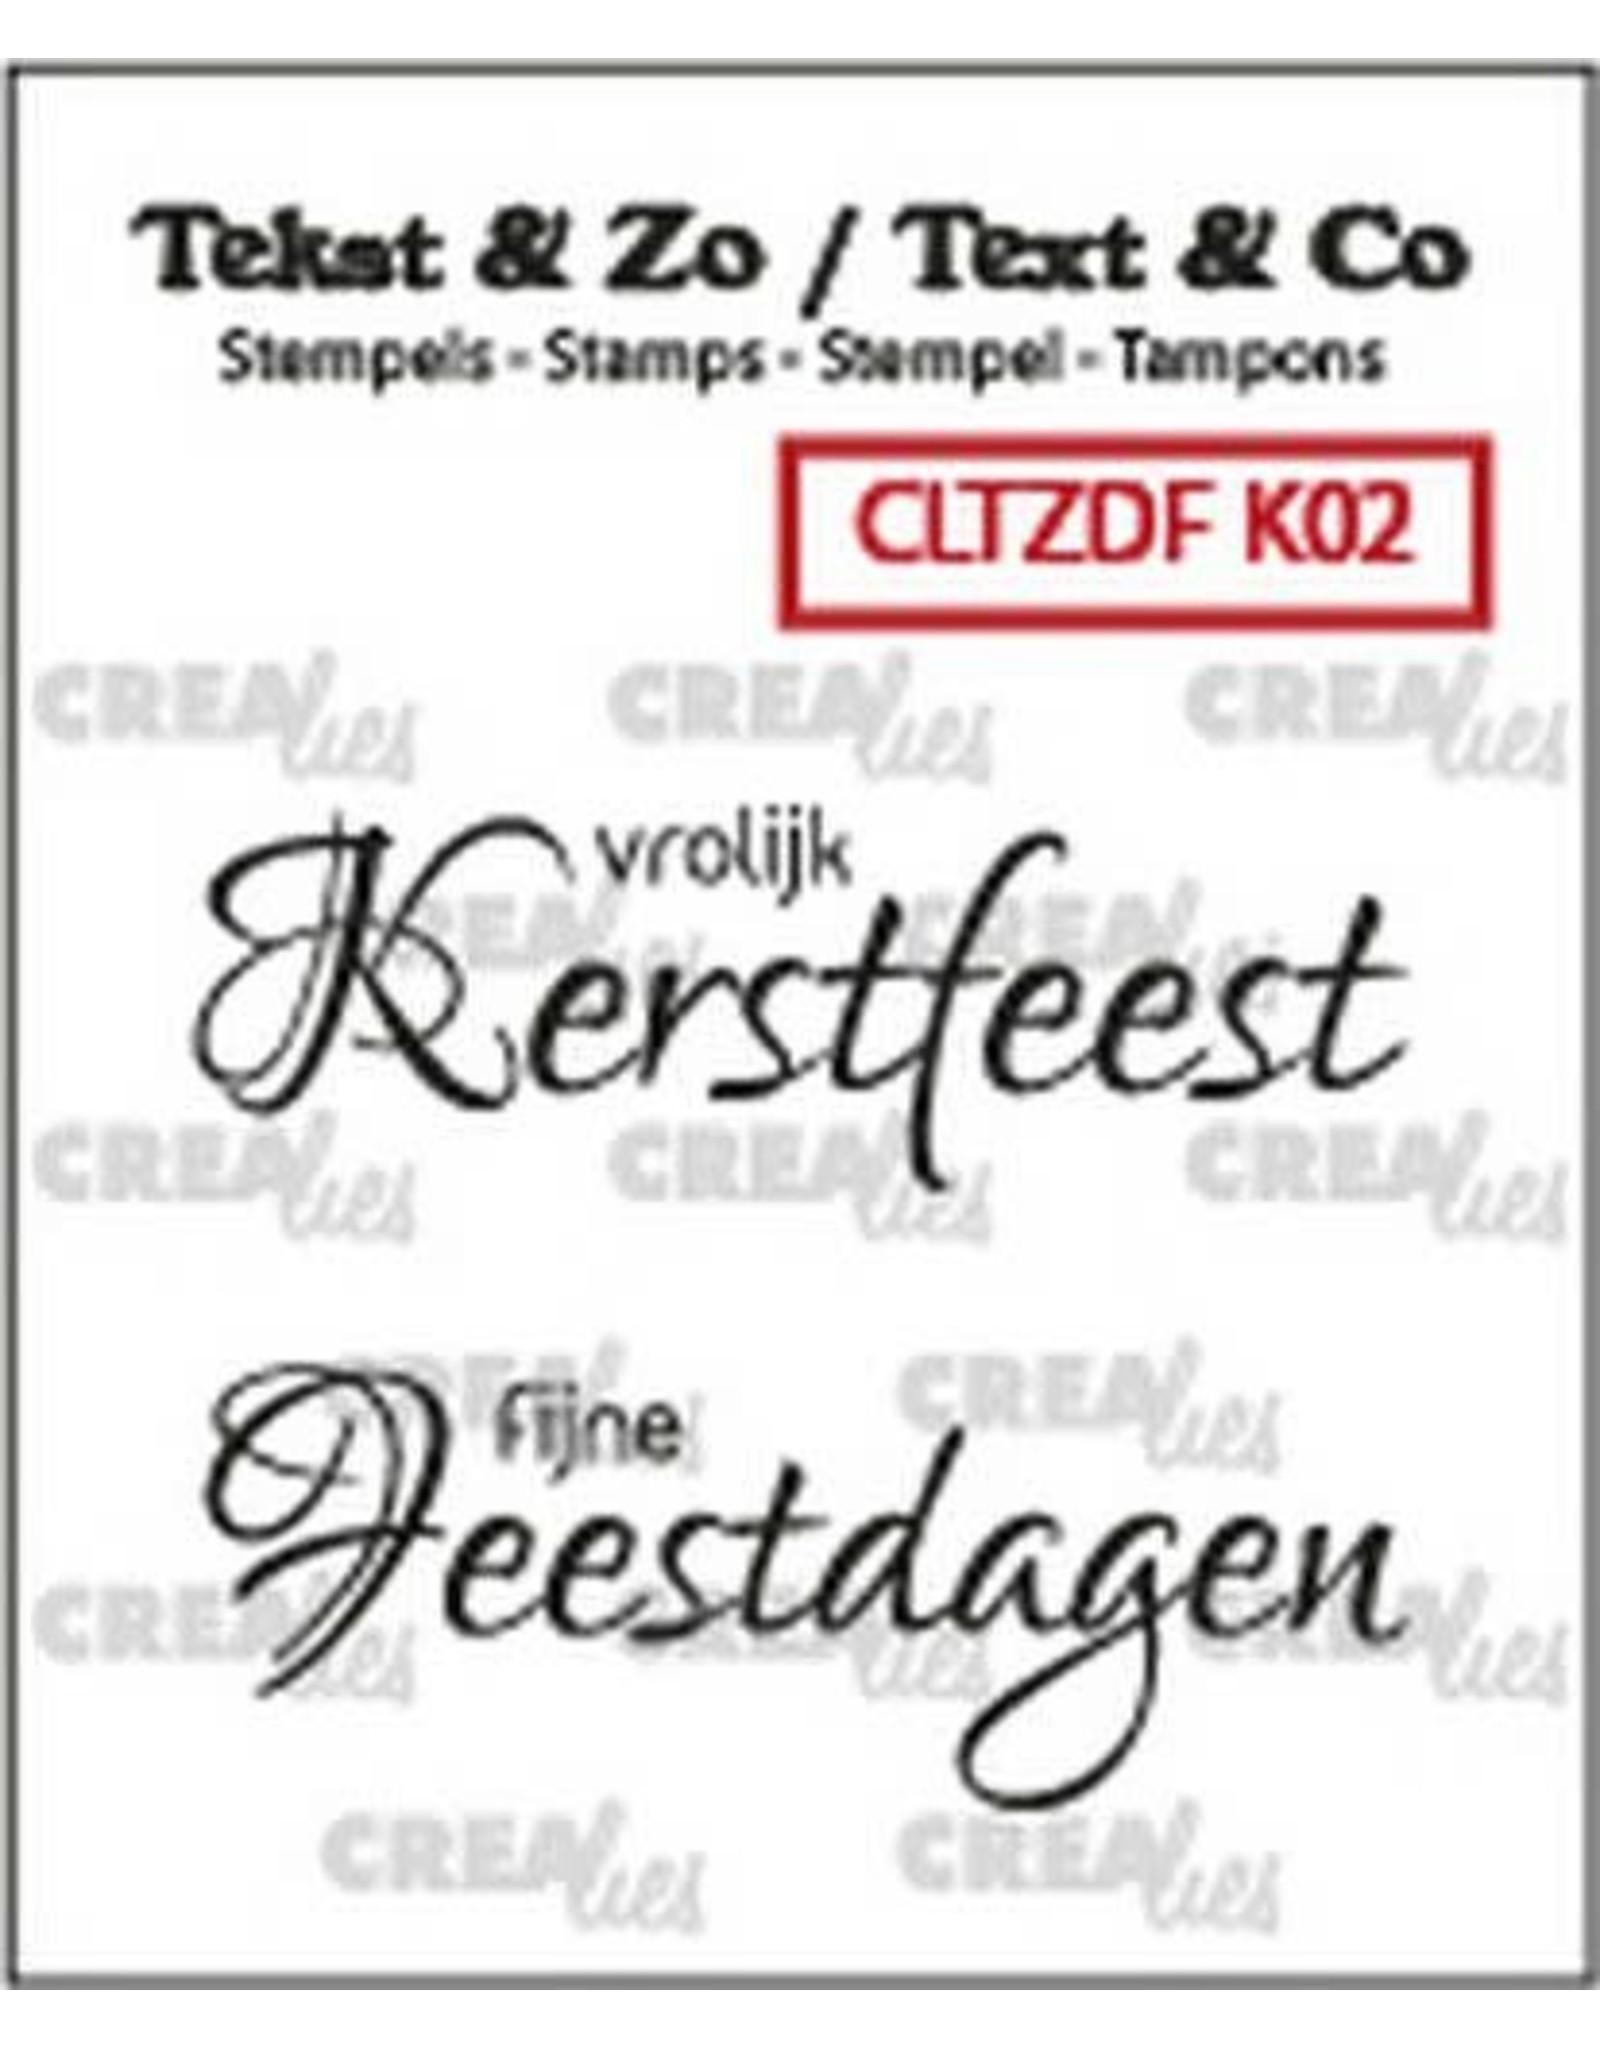 Crealies Crealies Clearstamp Tekst & Zo Font Kerst no. 2 (NL) CLTZDFK02 2x 15 x 42 mm